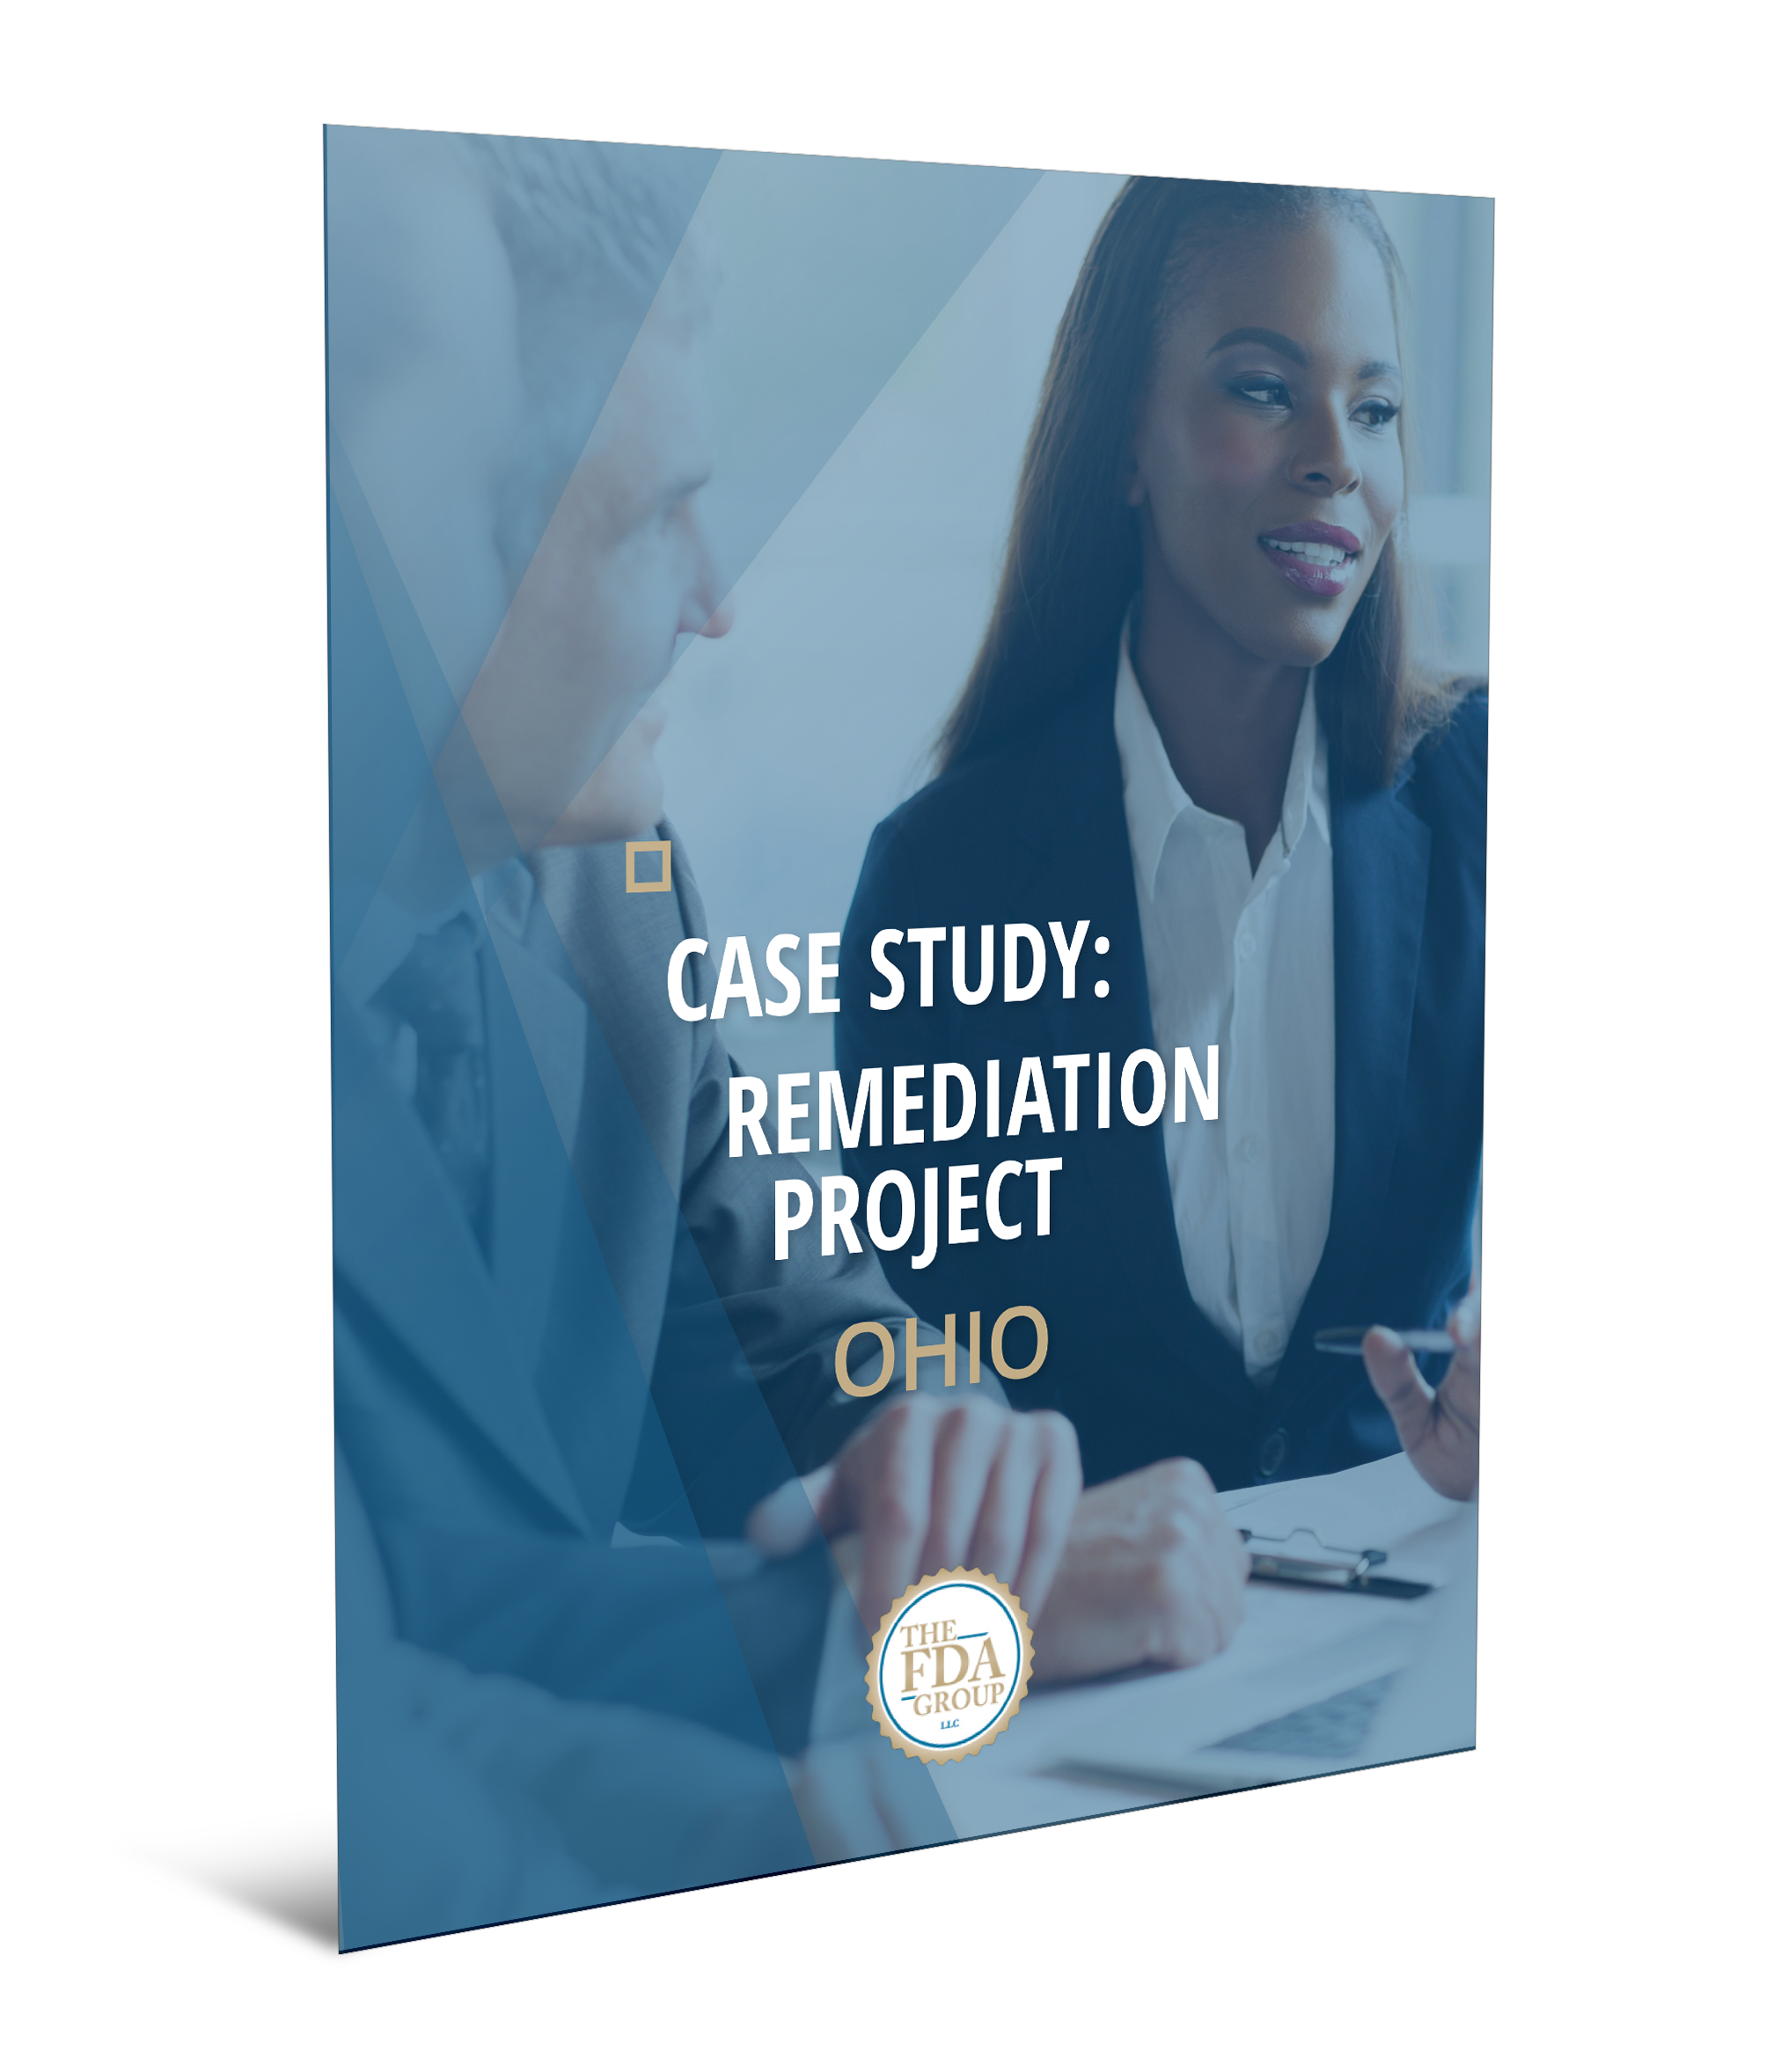 Cast Study: Remediation Project –Ohio